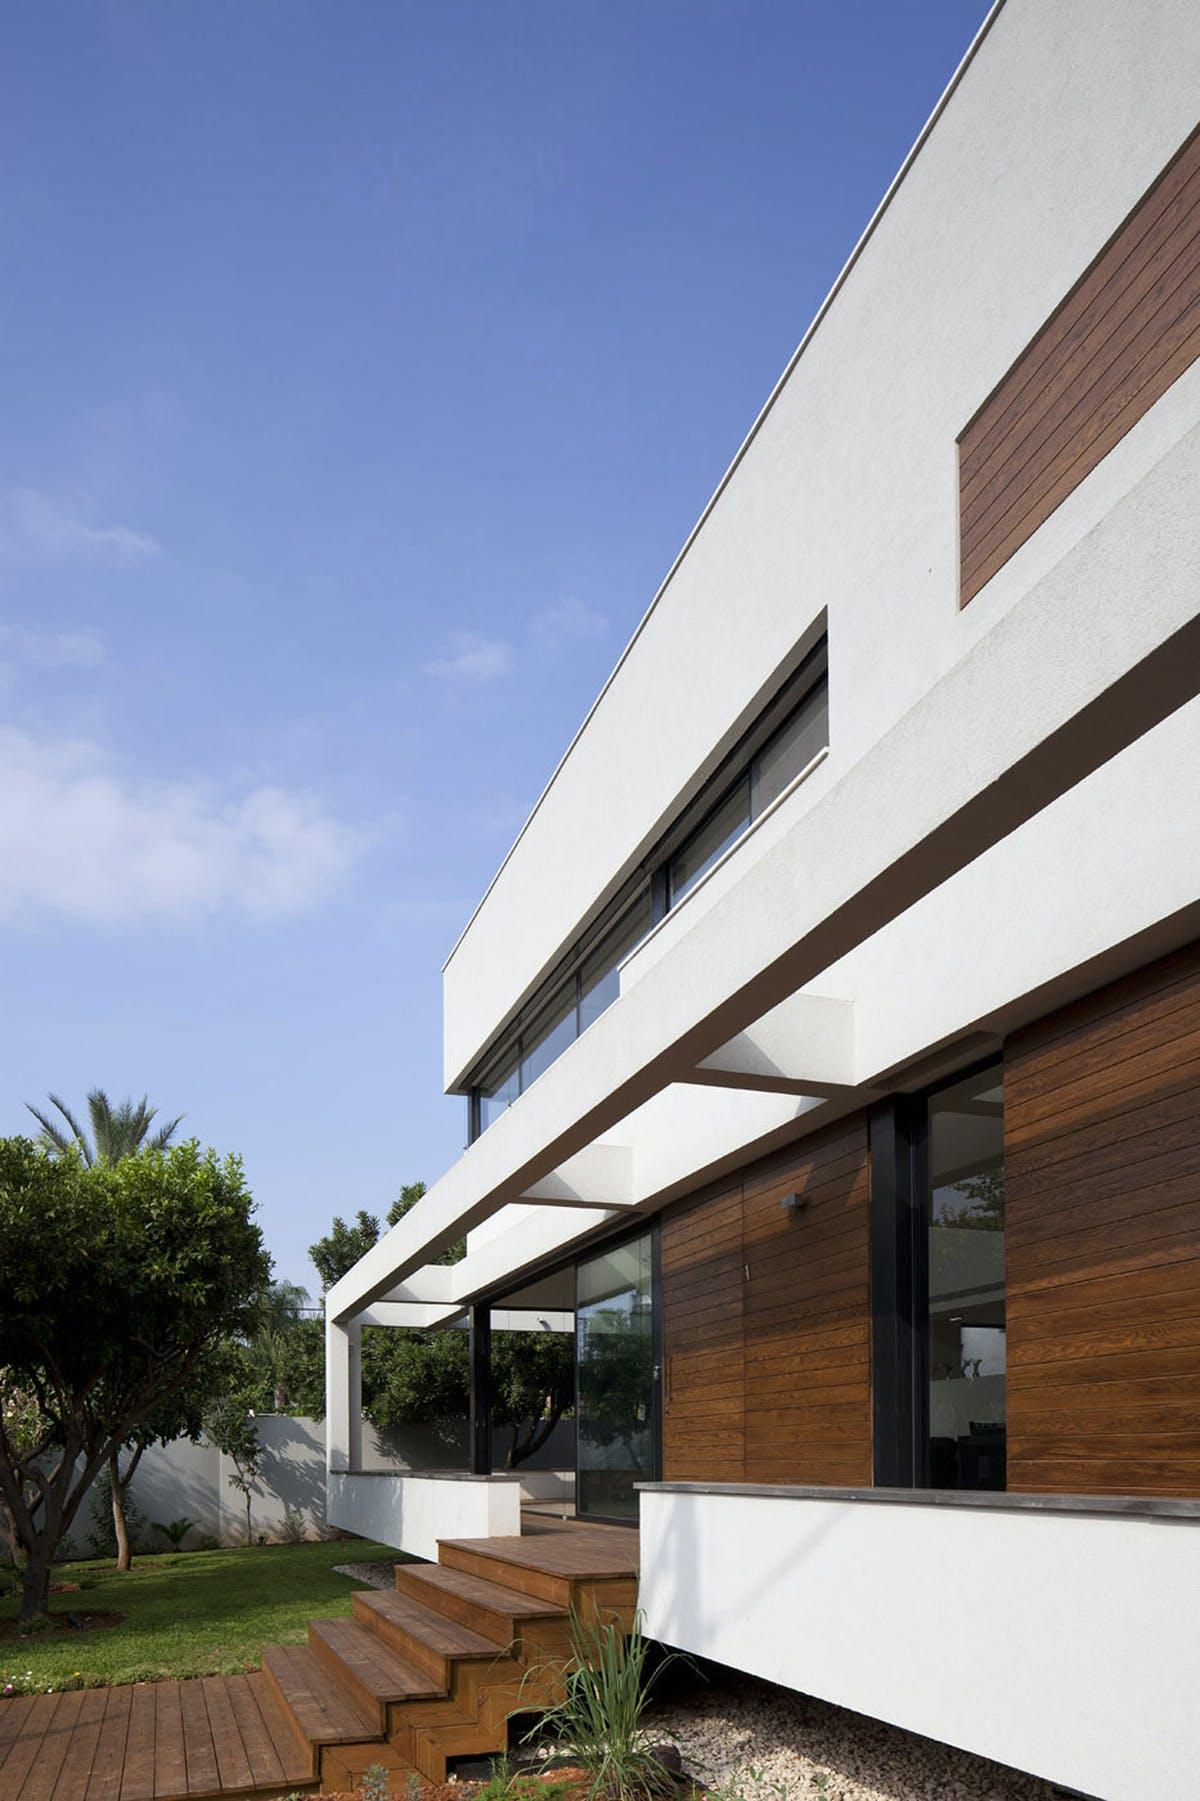 G HOUSE Contemporary Mediterranean Villa PazGersh Architecture